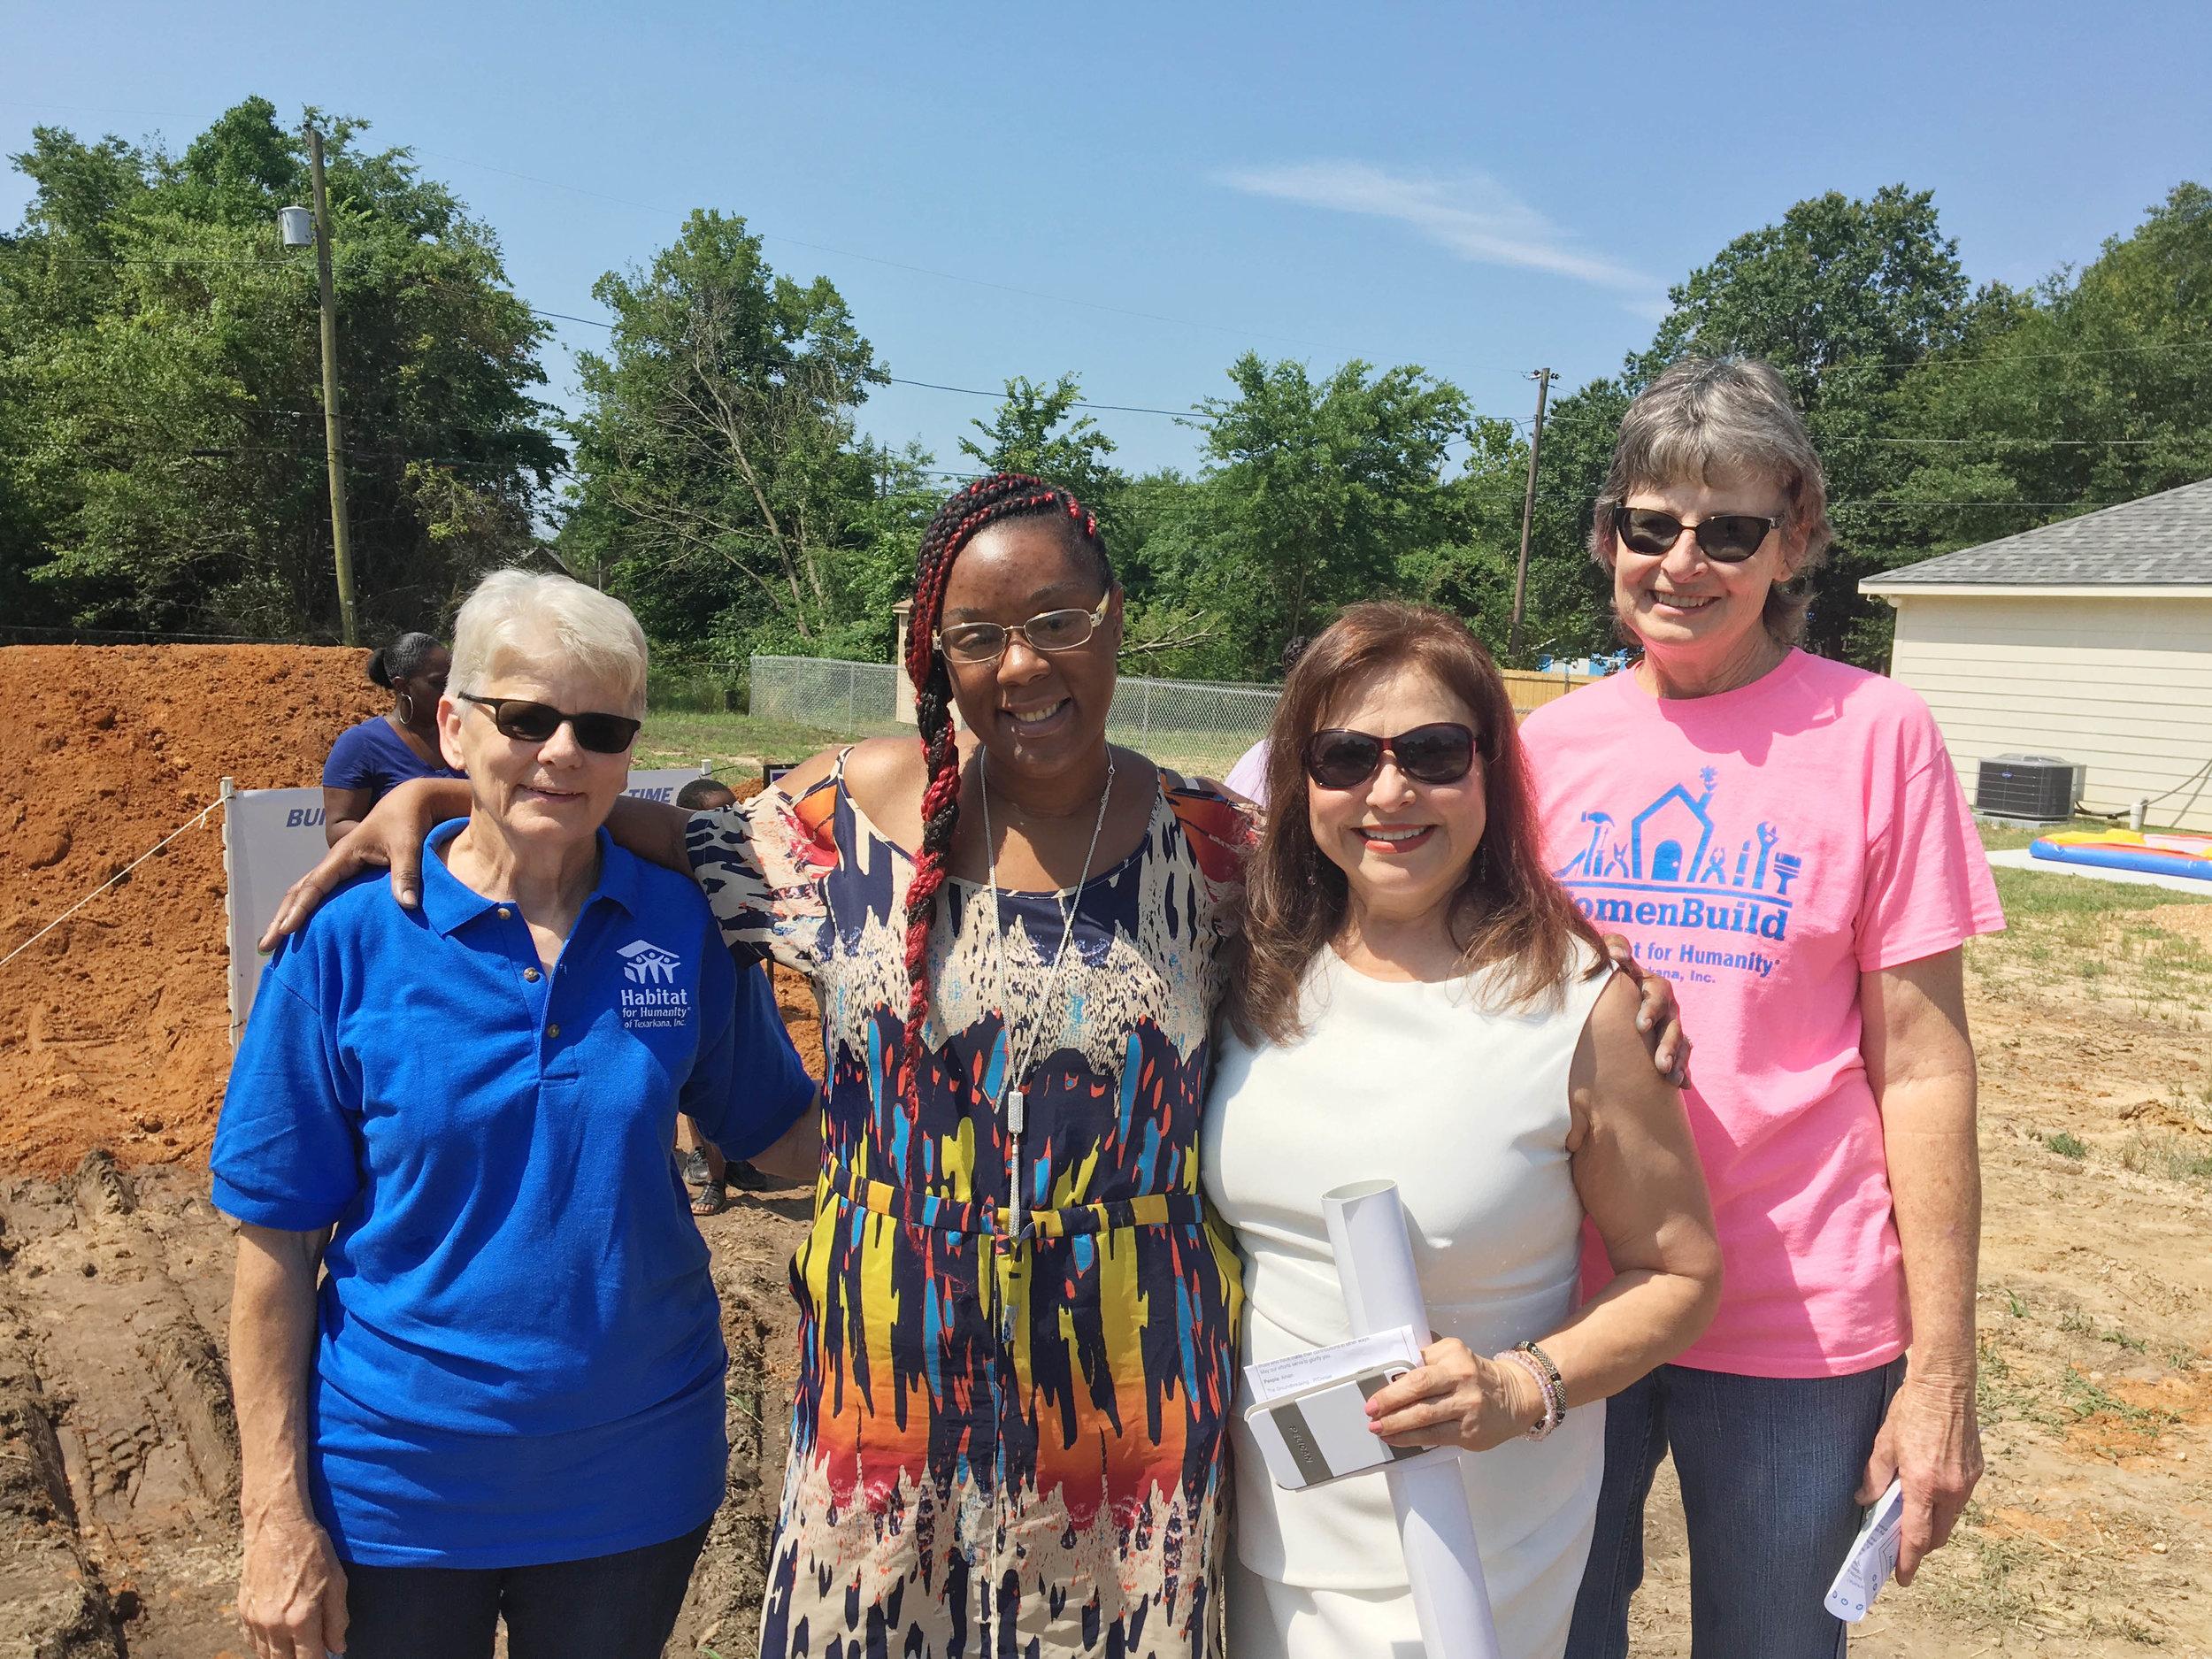 Judy Head, Barbara Jackson, Mary Wormington and Carolyn deBie